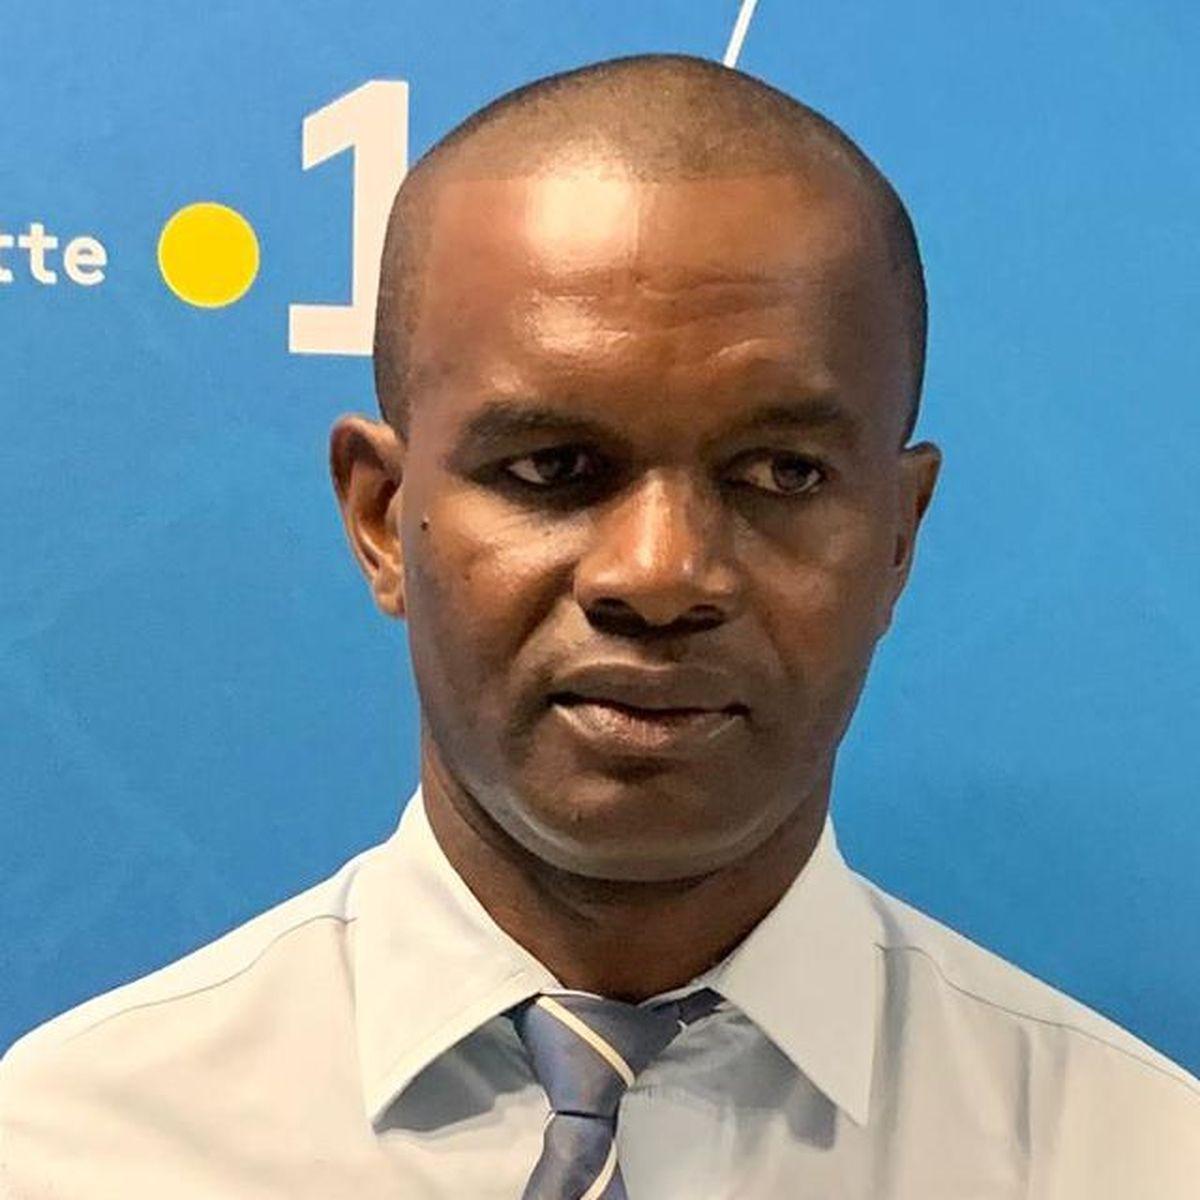 Municipales 2020 : Le maire sortant de Bandraboua, Boura Soulaimana